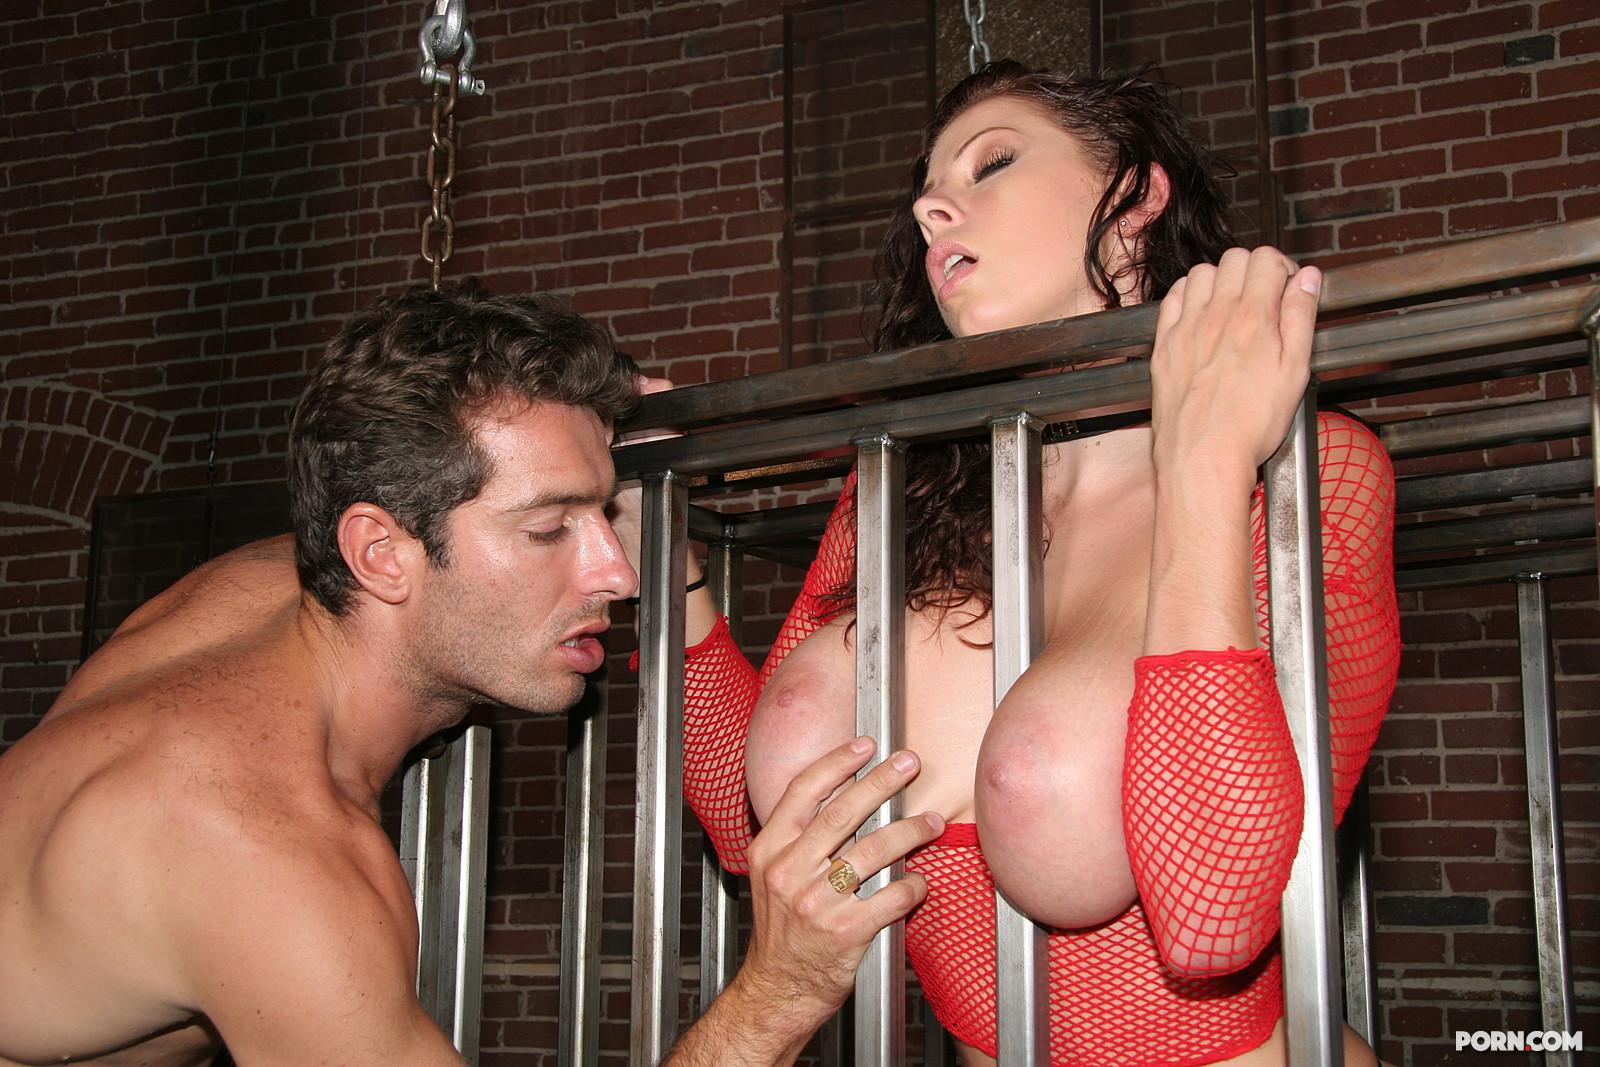 Рабыни ублажают хозяина порно онлайн 21 фотография